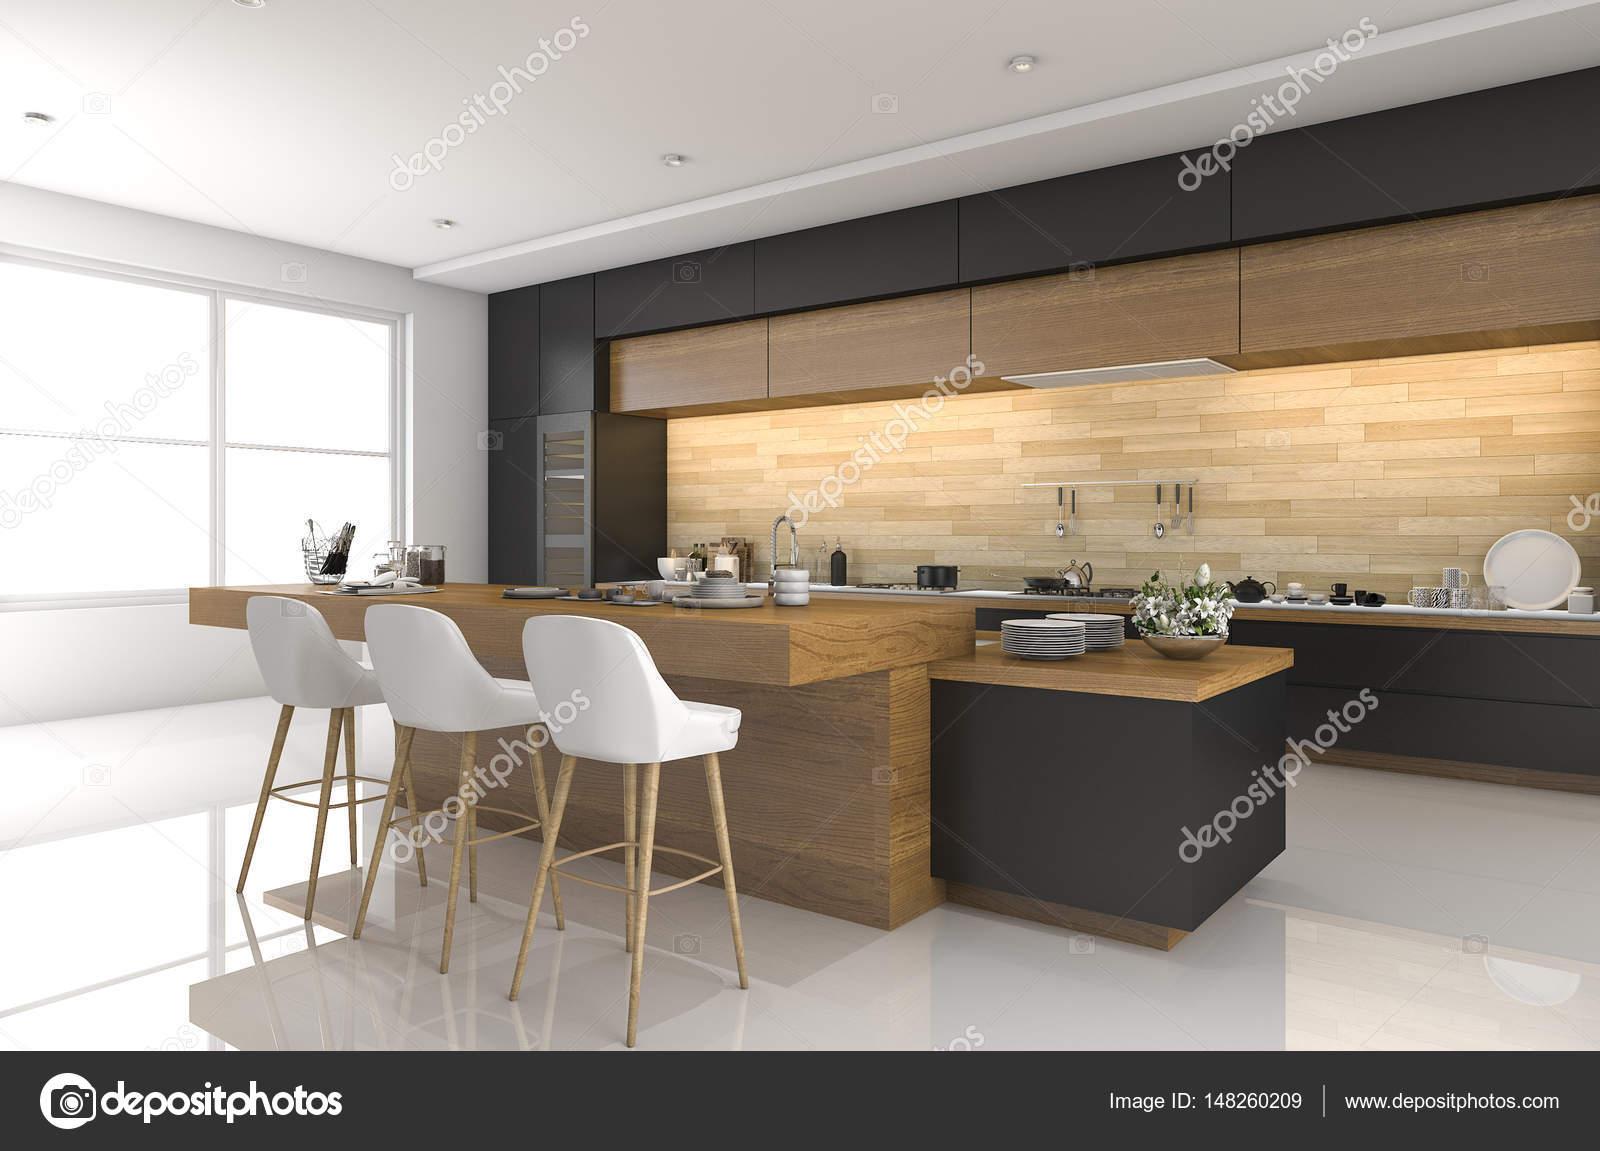 Moderne Zwarte Keuken : 3d rendering moderne zwarte keuken met hout decor u2014 stockfoto